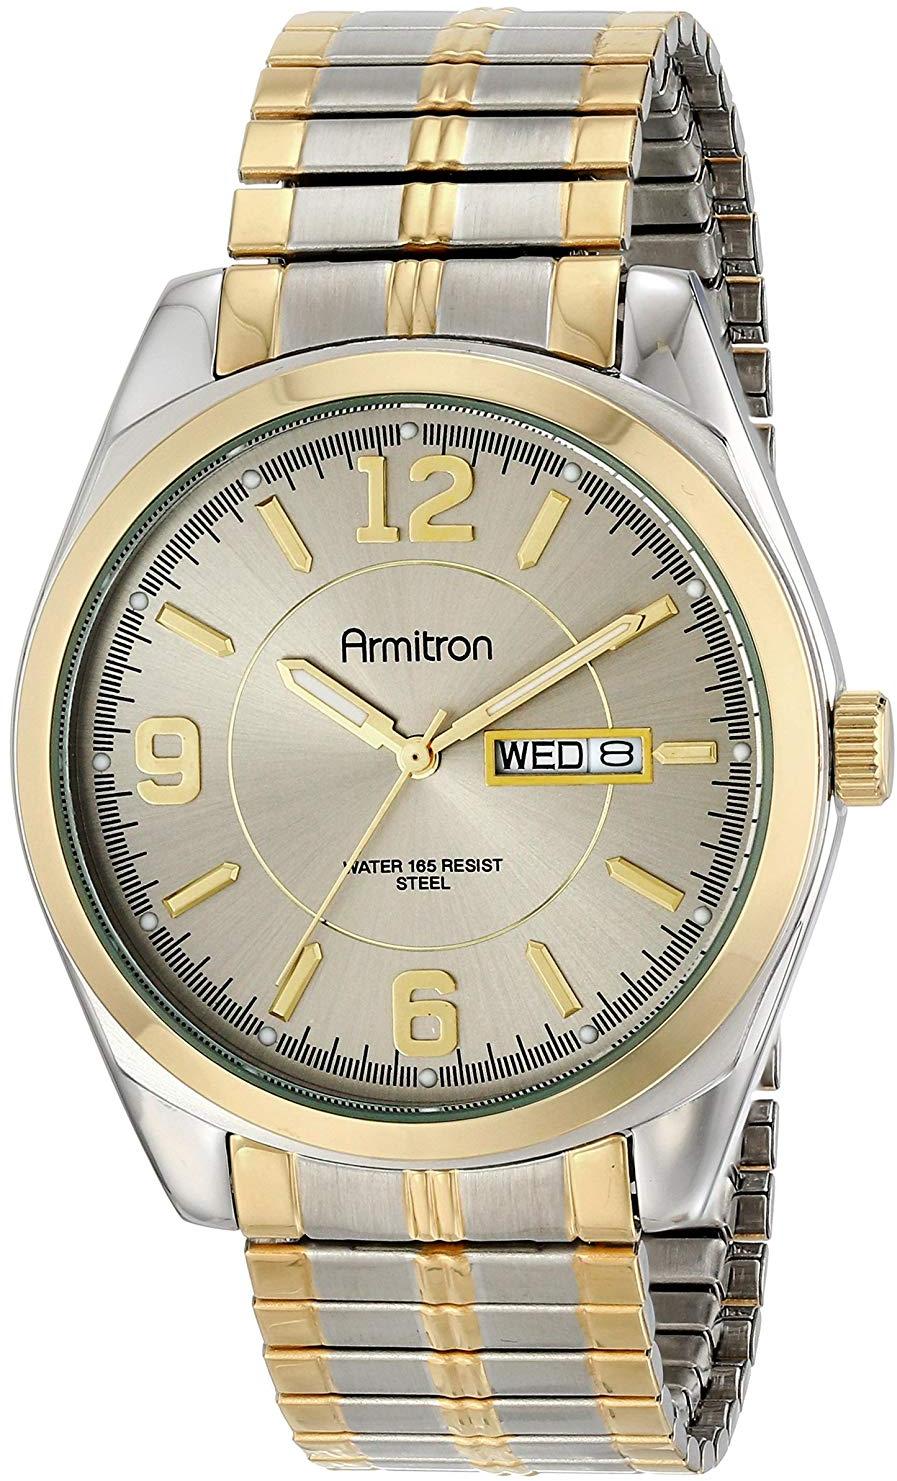 dd51ffcce098 Armitron Men's 204591GYTT Two-Tone Expansion Band Dress Watch - $108.84